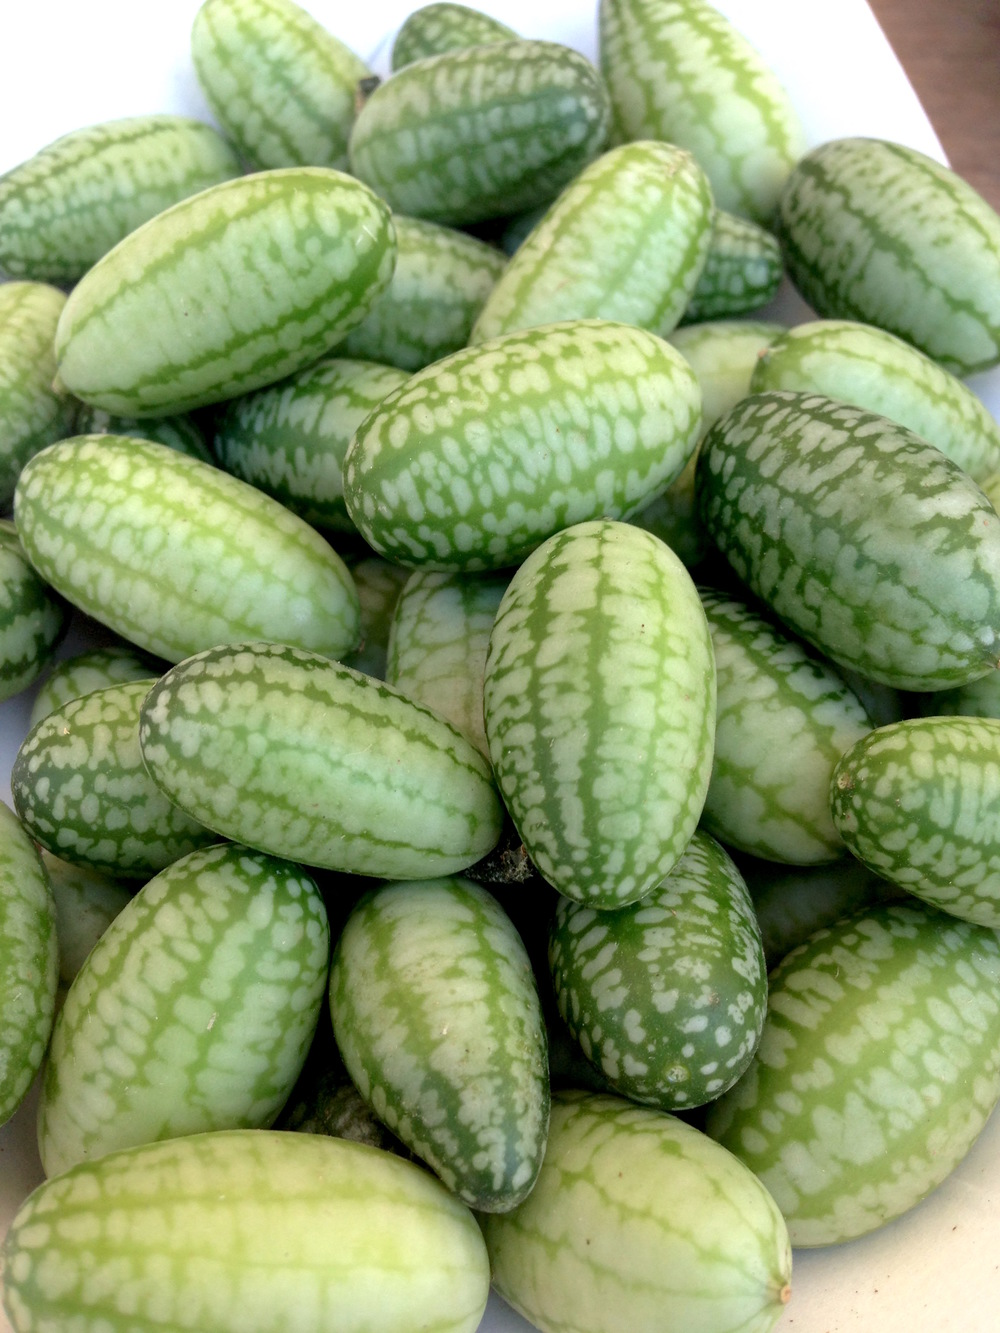 Mini watermelon cucumbers from the delightful and magical  Ojai Farmers Market